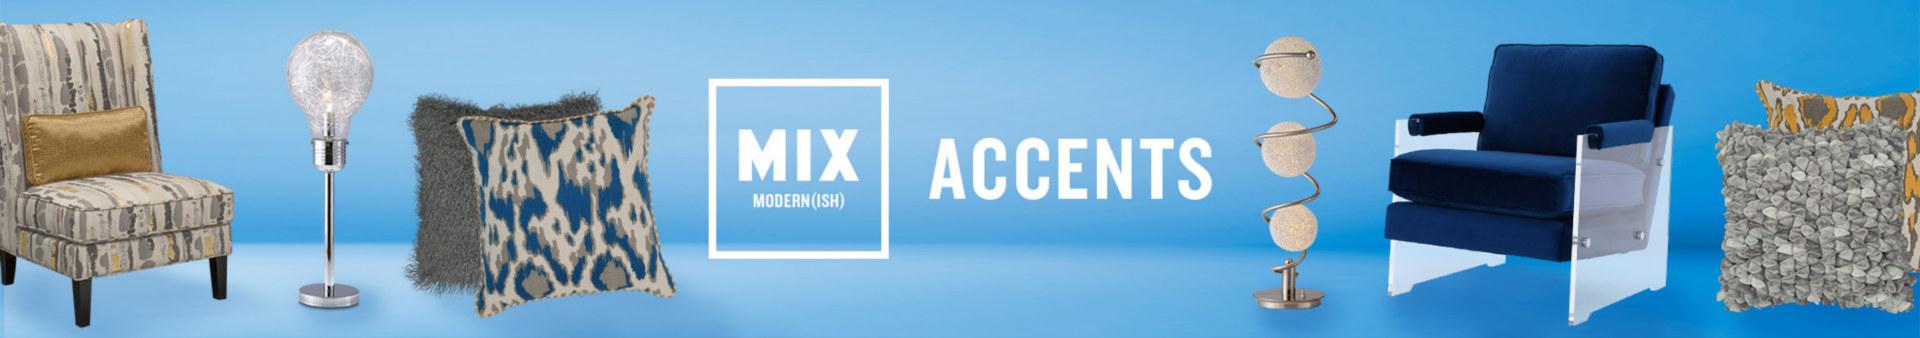 modern(ish) accents